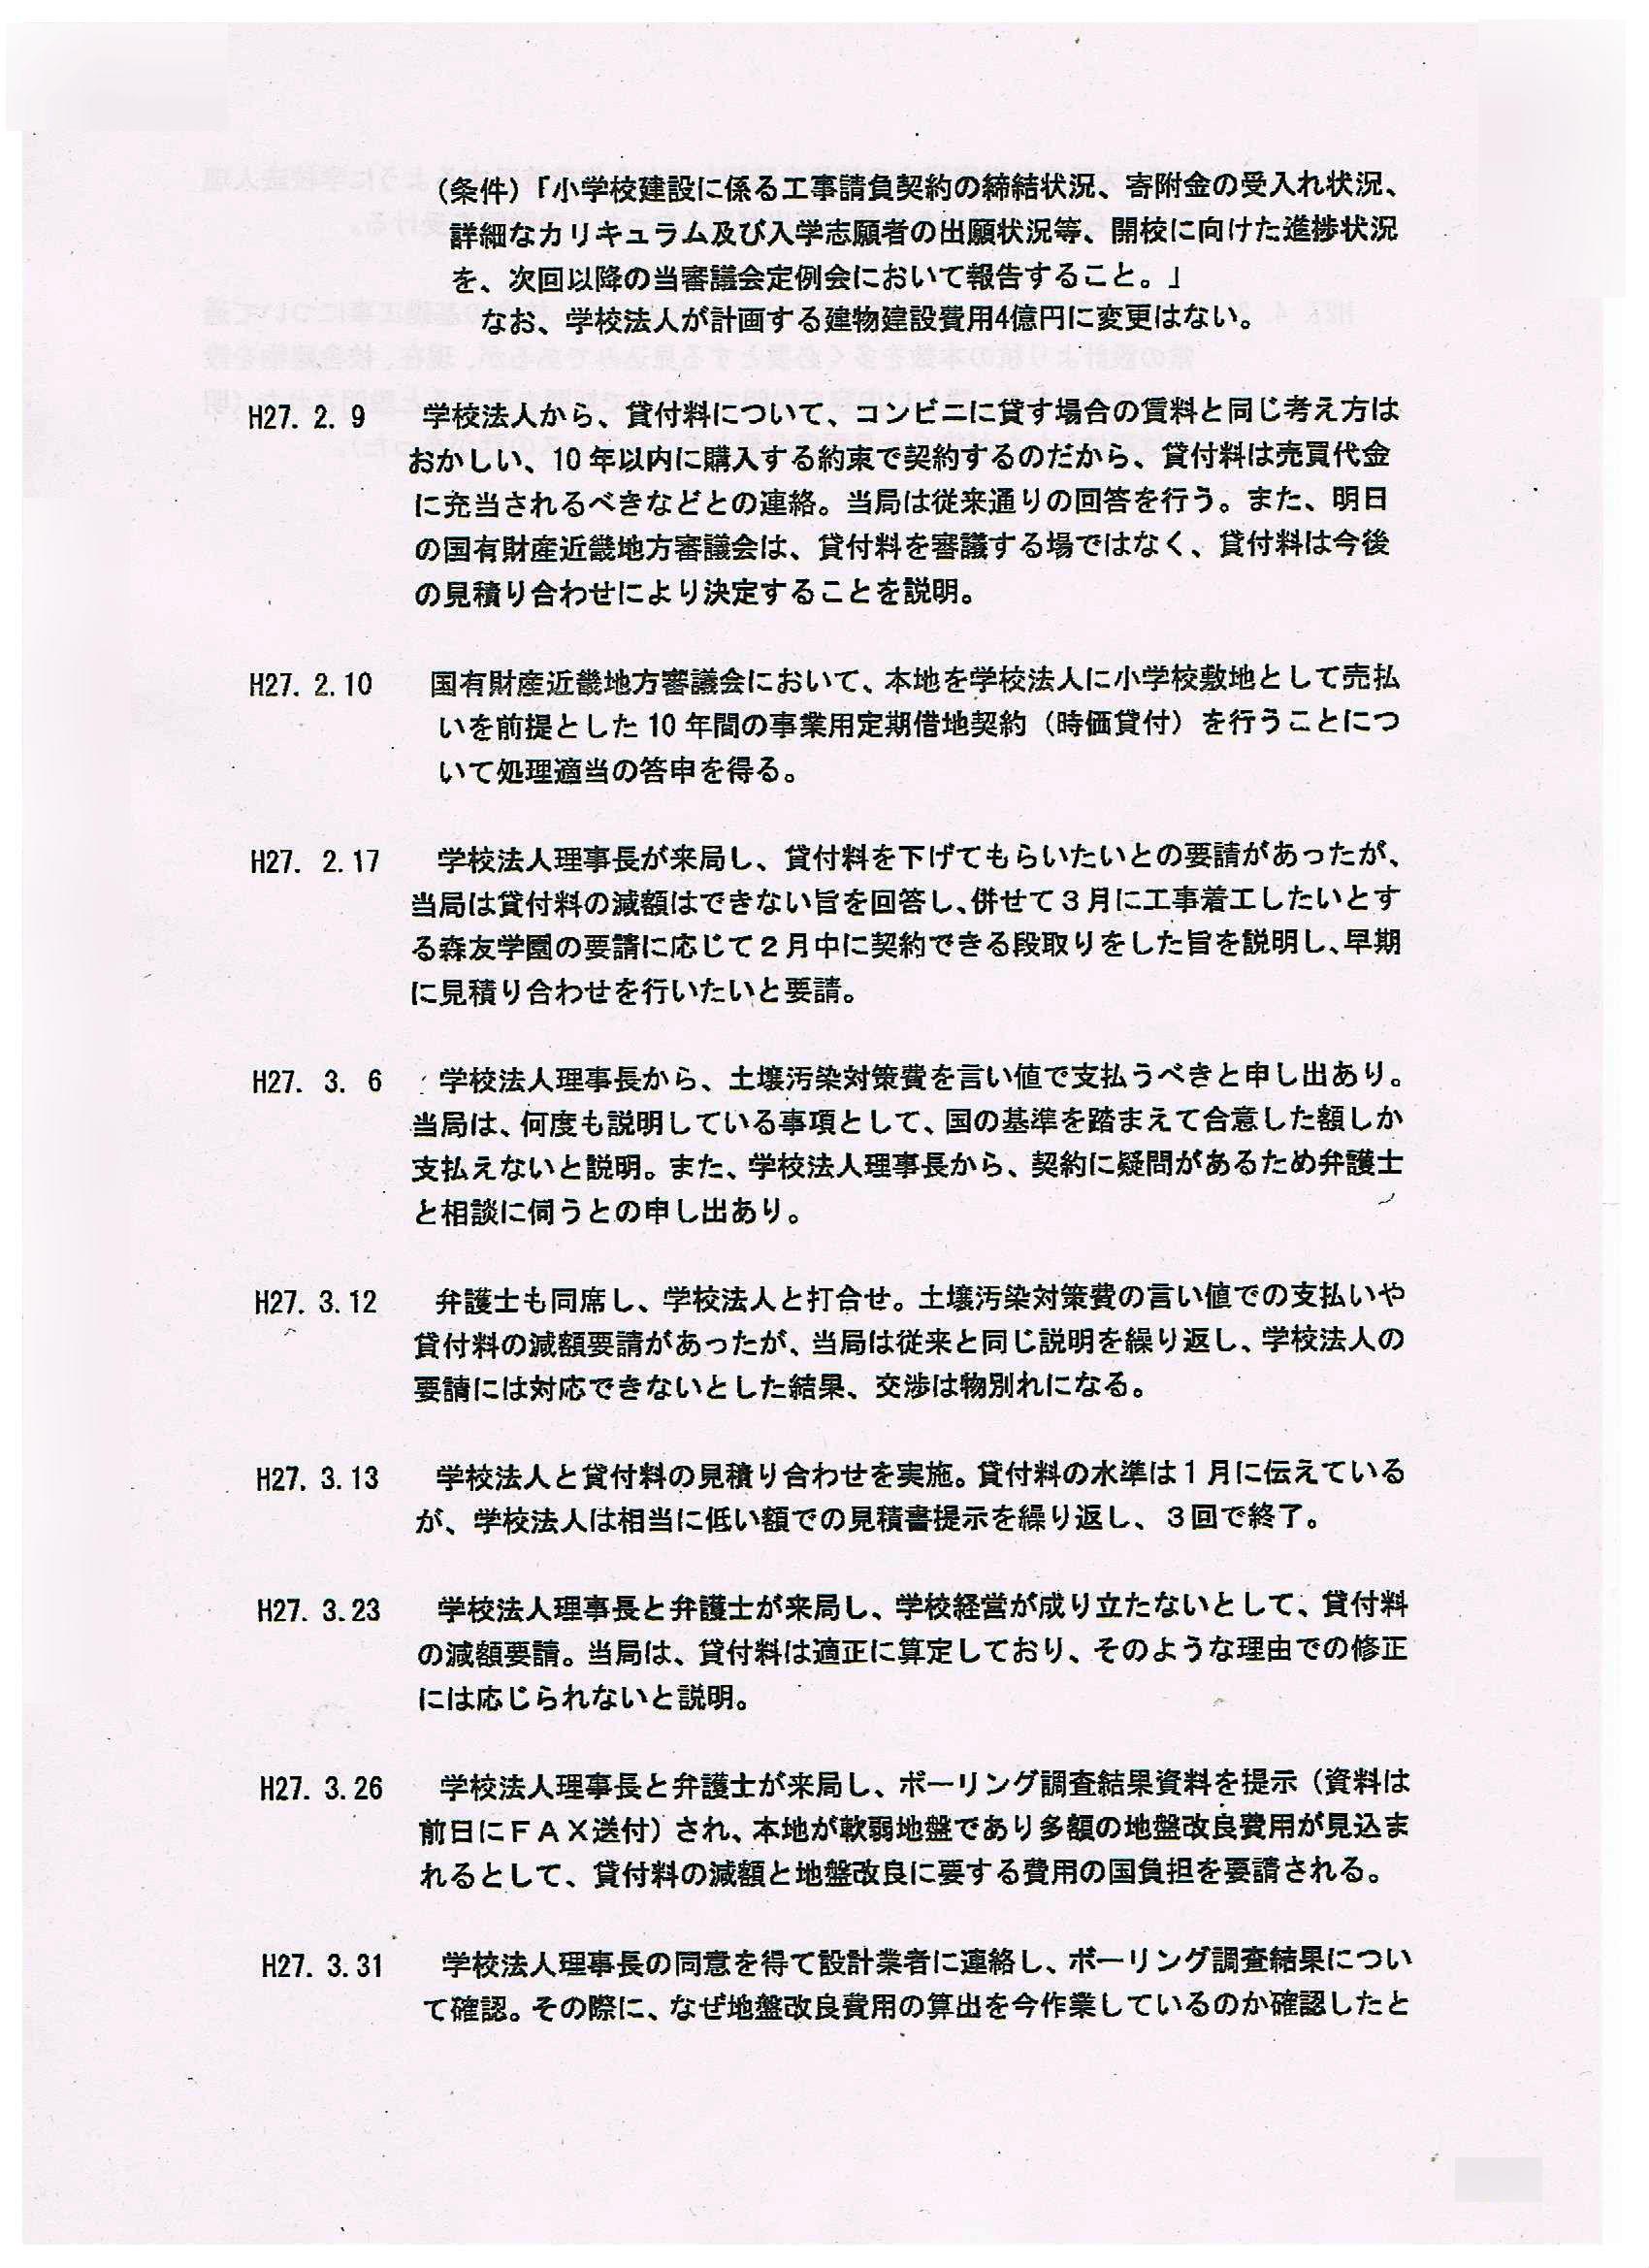 http://hunter-investigate.jp/news/10eedb26ccd69f48cb21c7aab766dcf9c57d965c.jpg